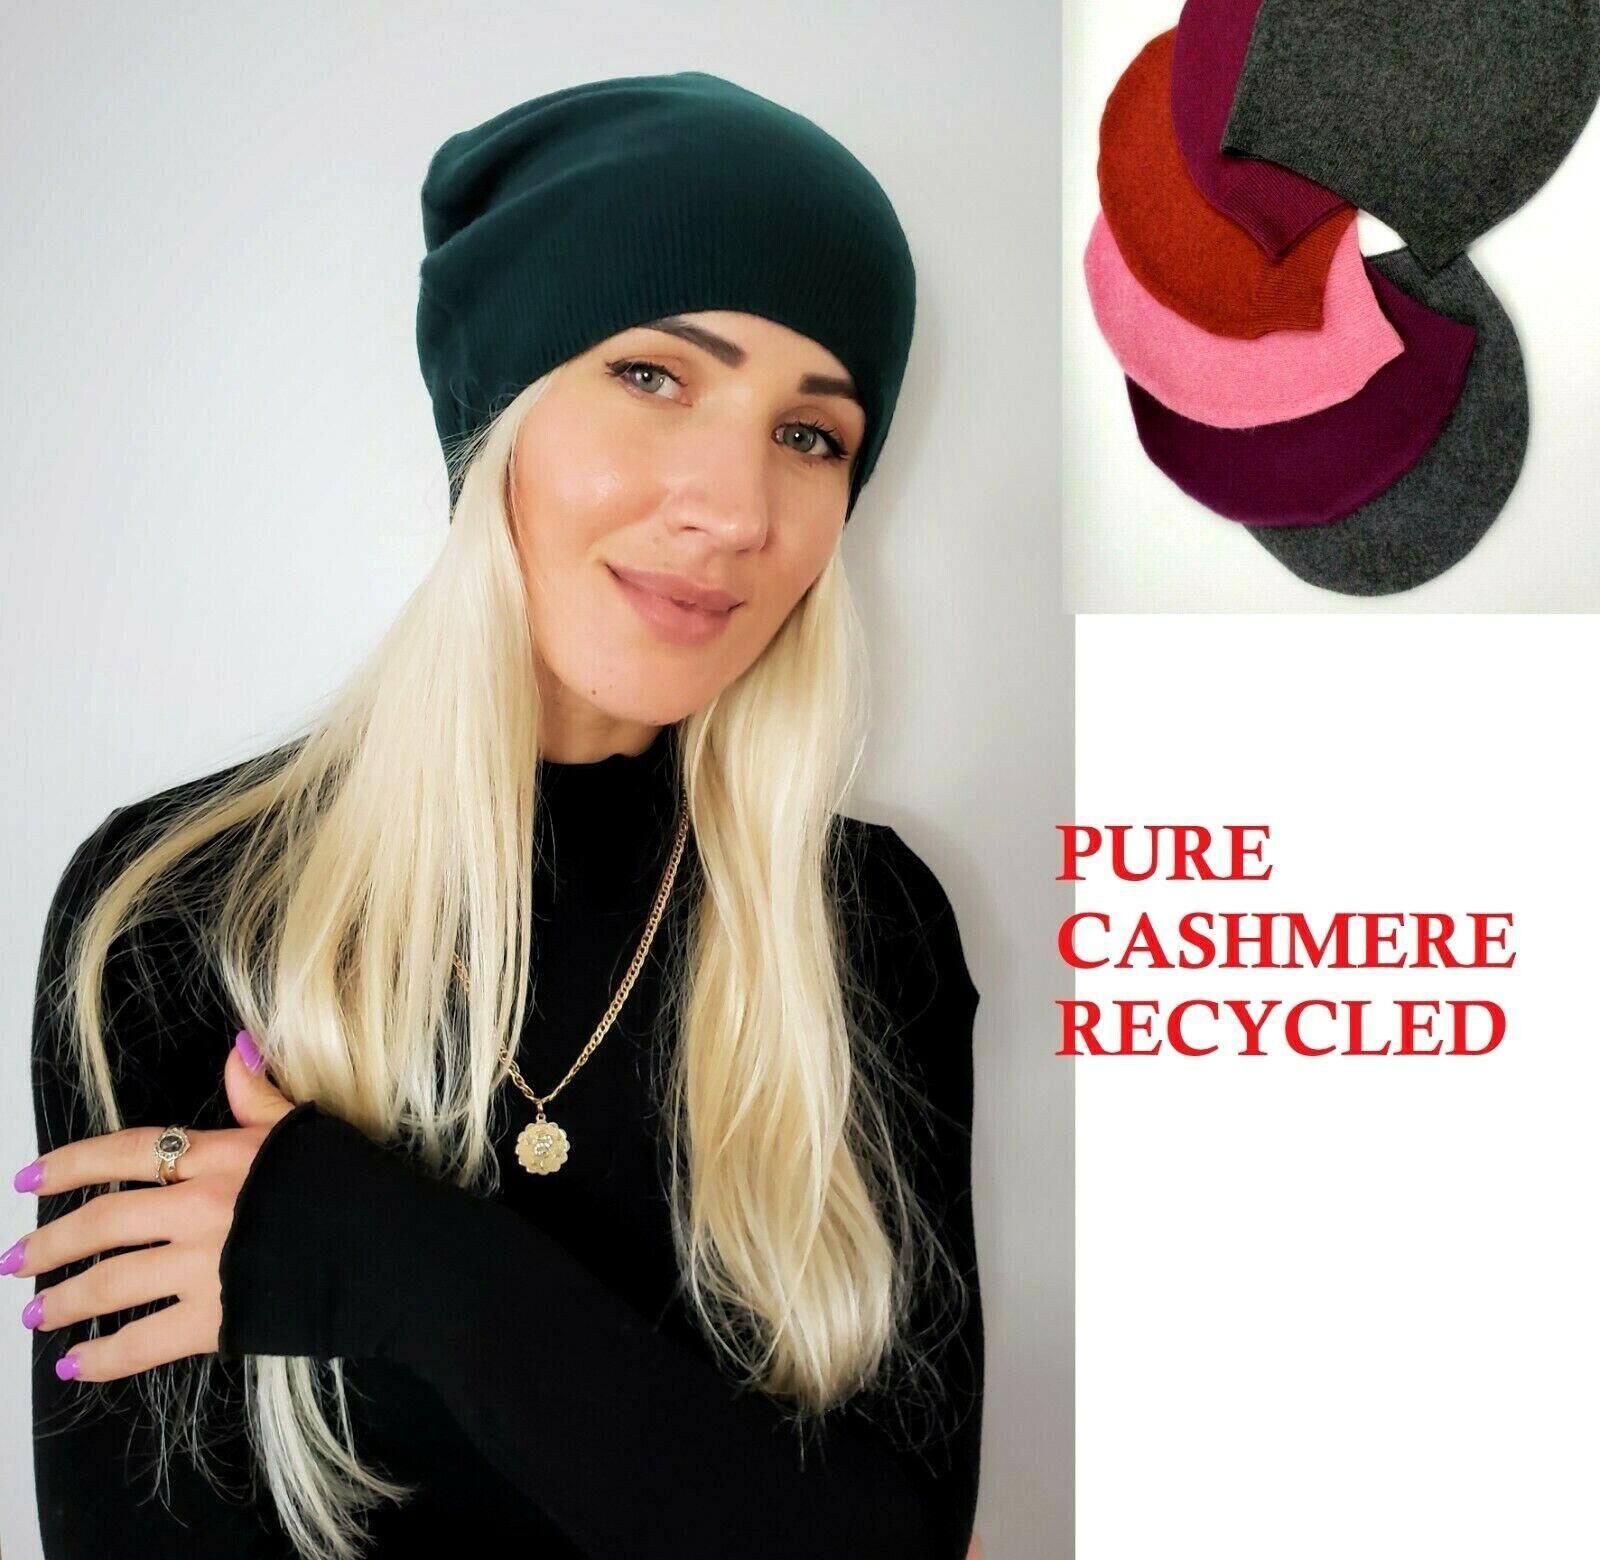 # 100% Pure Cashmere Sombrero Gorro de Lana Hombre Mujer Unisex Hecho a Mano A005